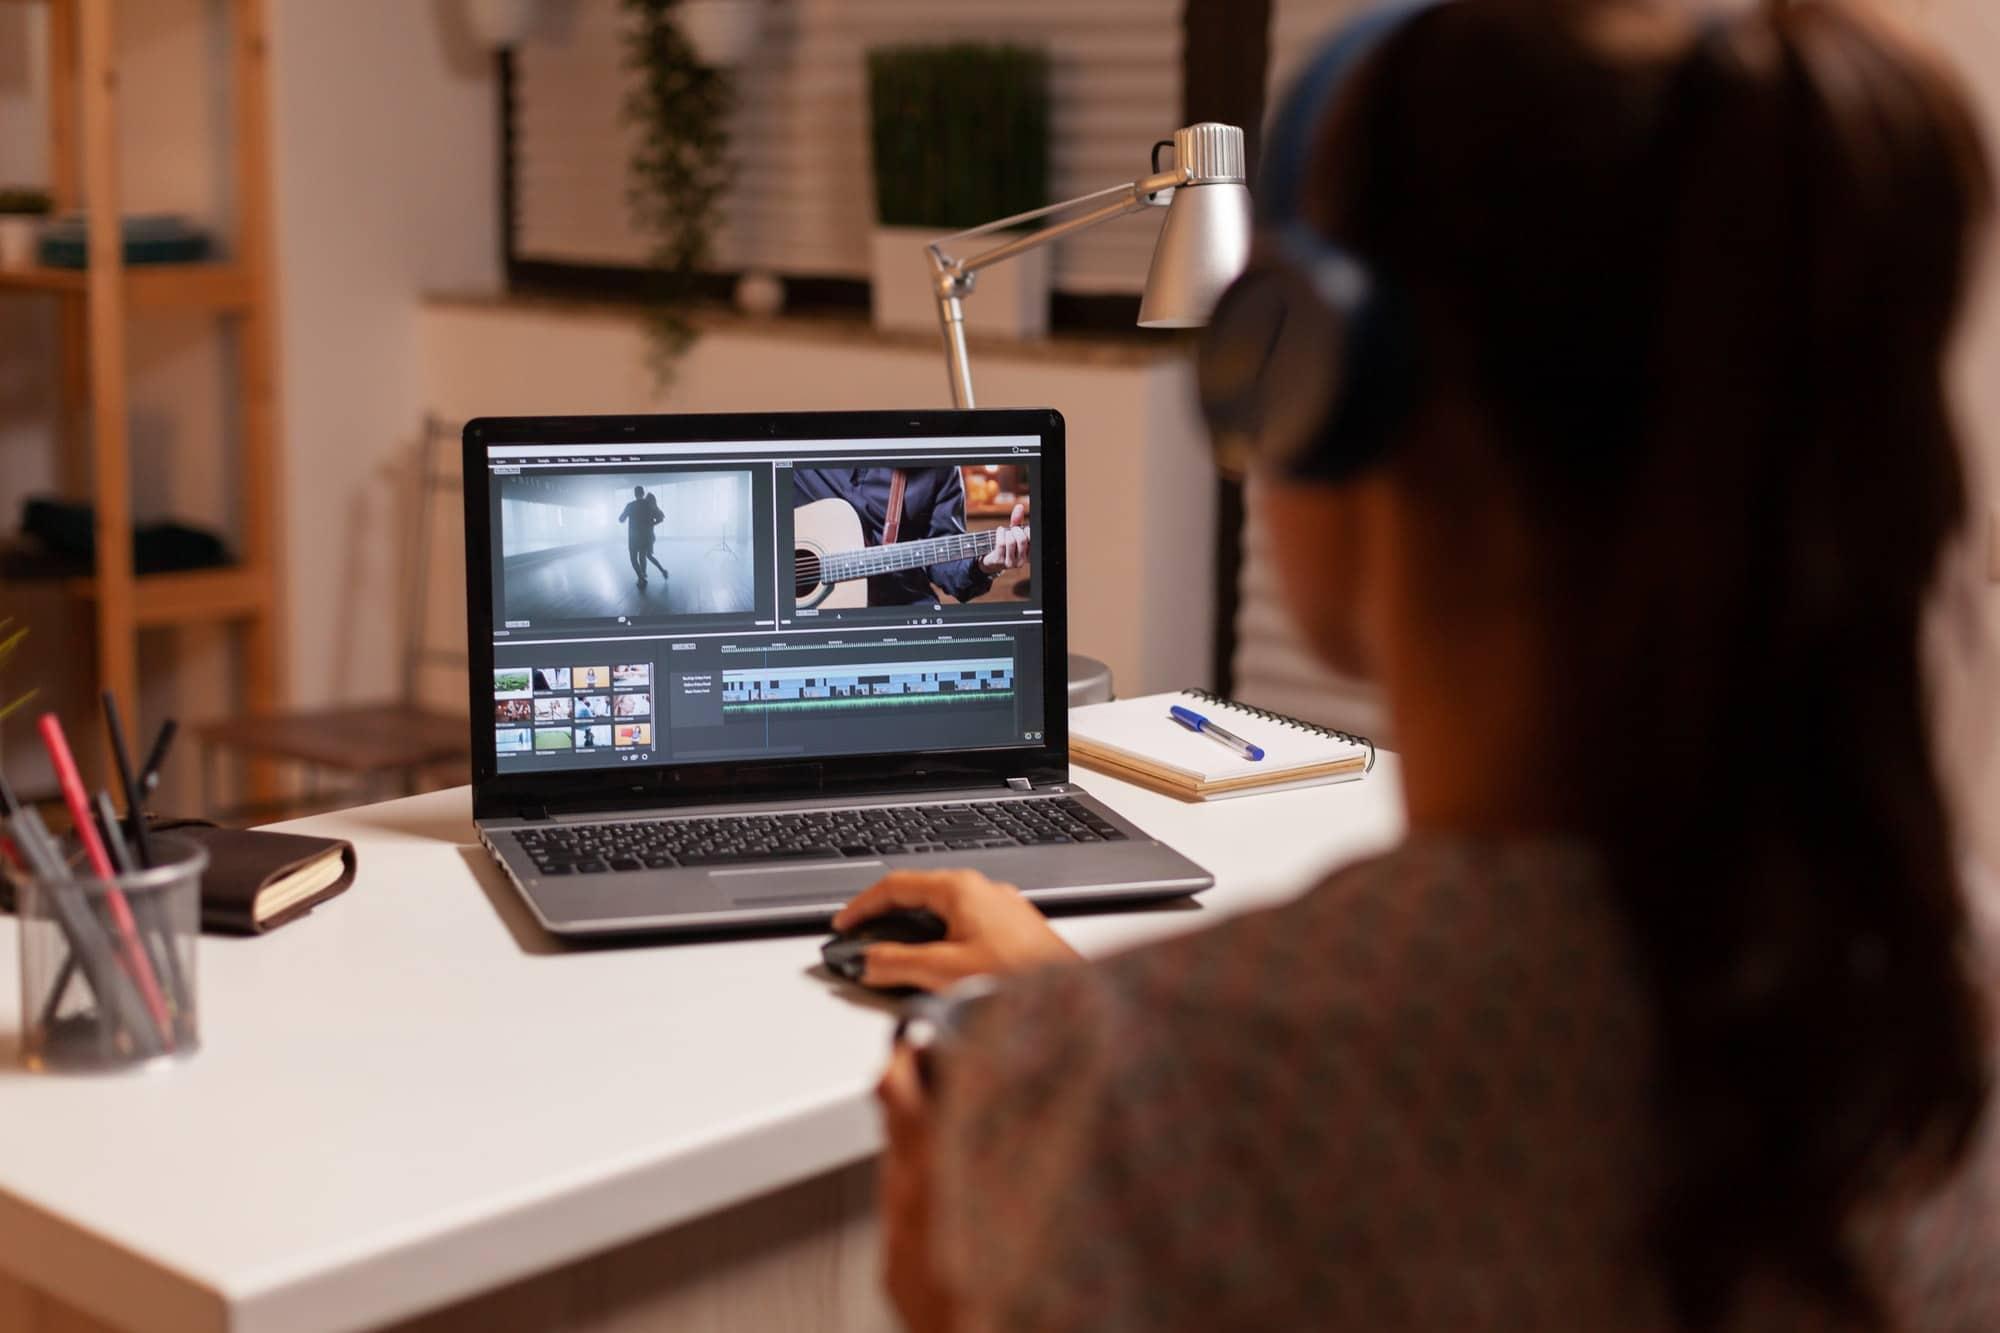 Filmmaker editing video footage